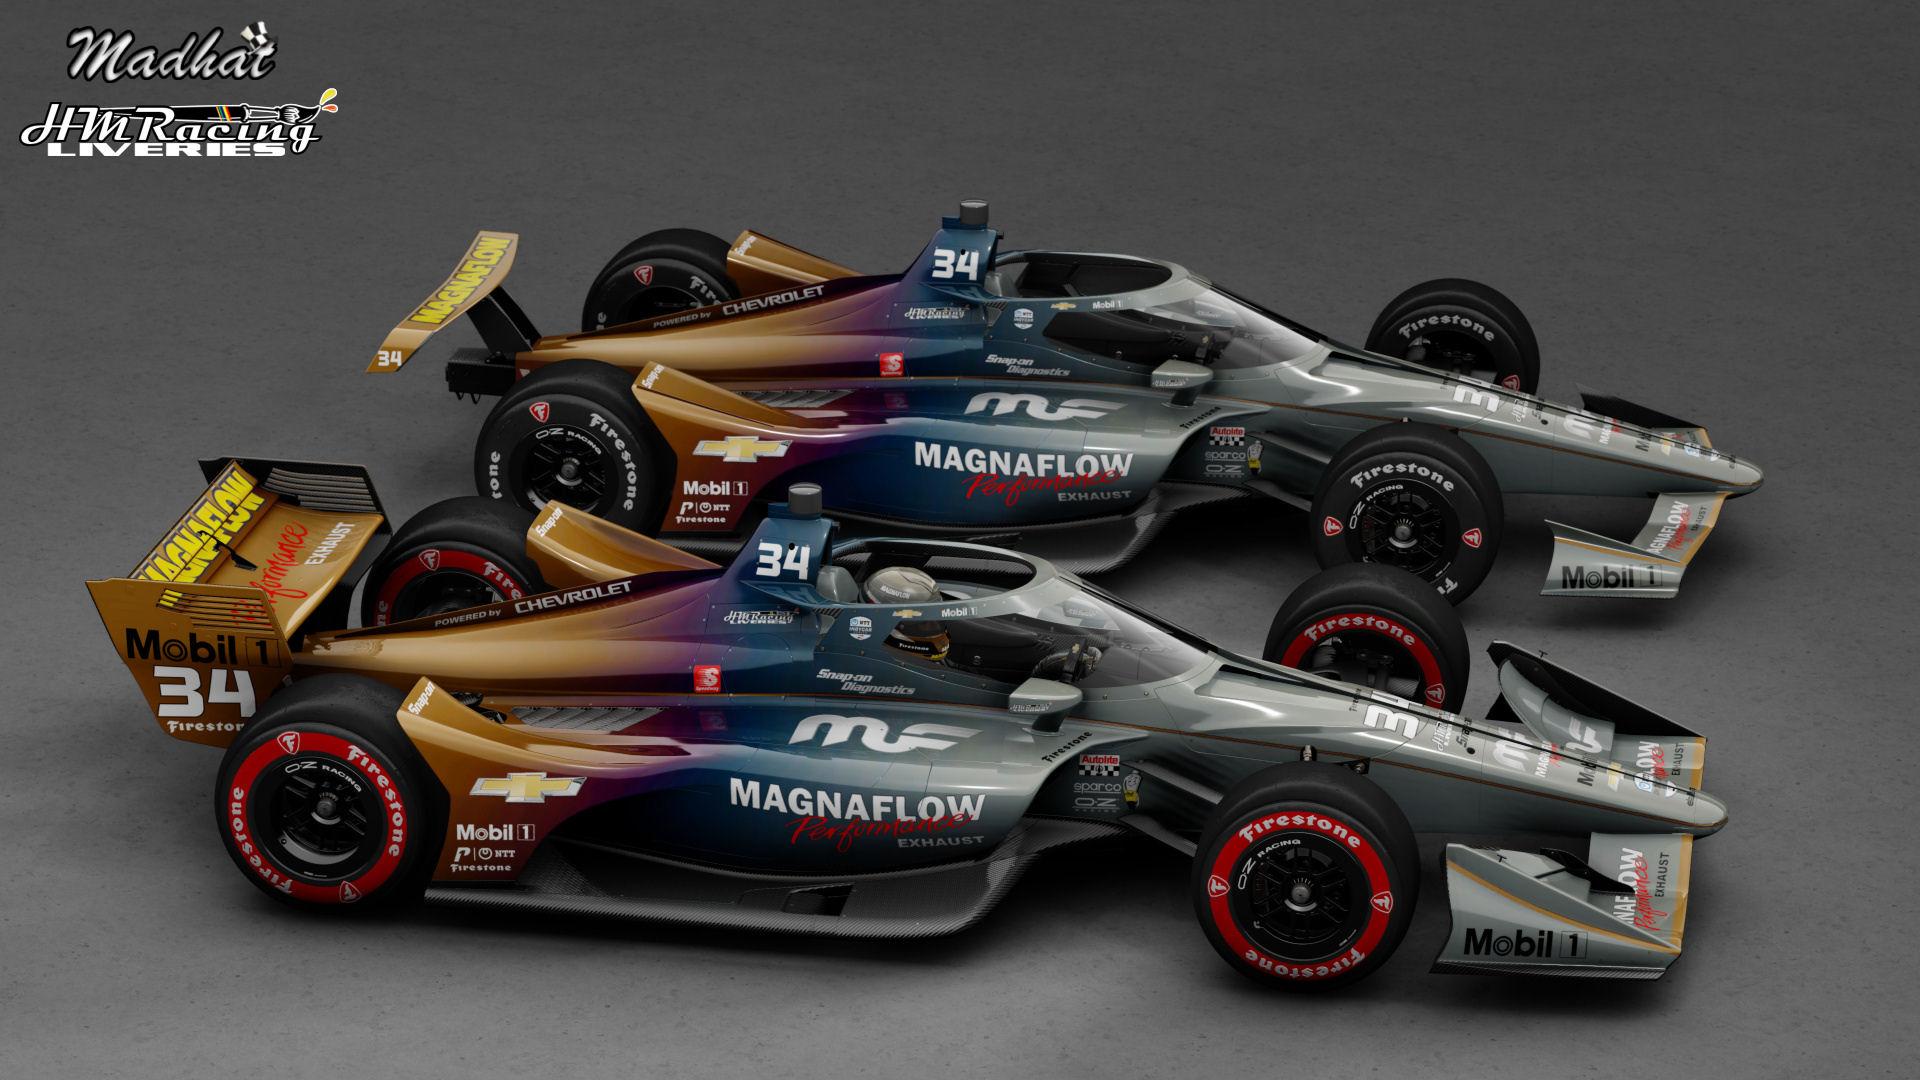 MAGNAFLOW 34 IndyCar Madhat HMRacing Liveries 03.jpg